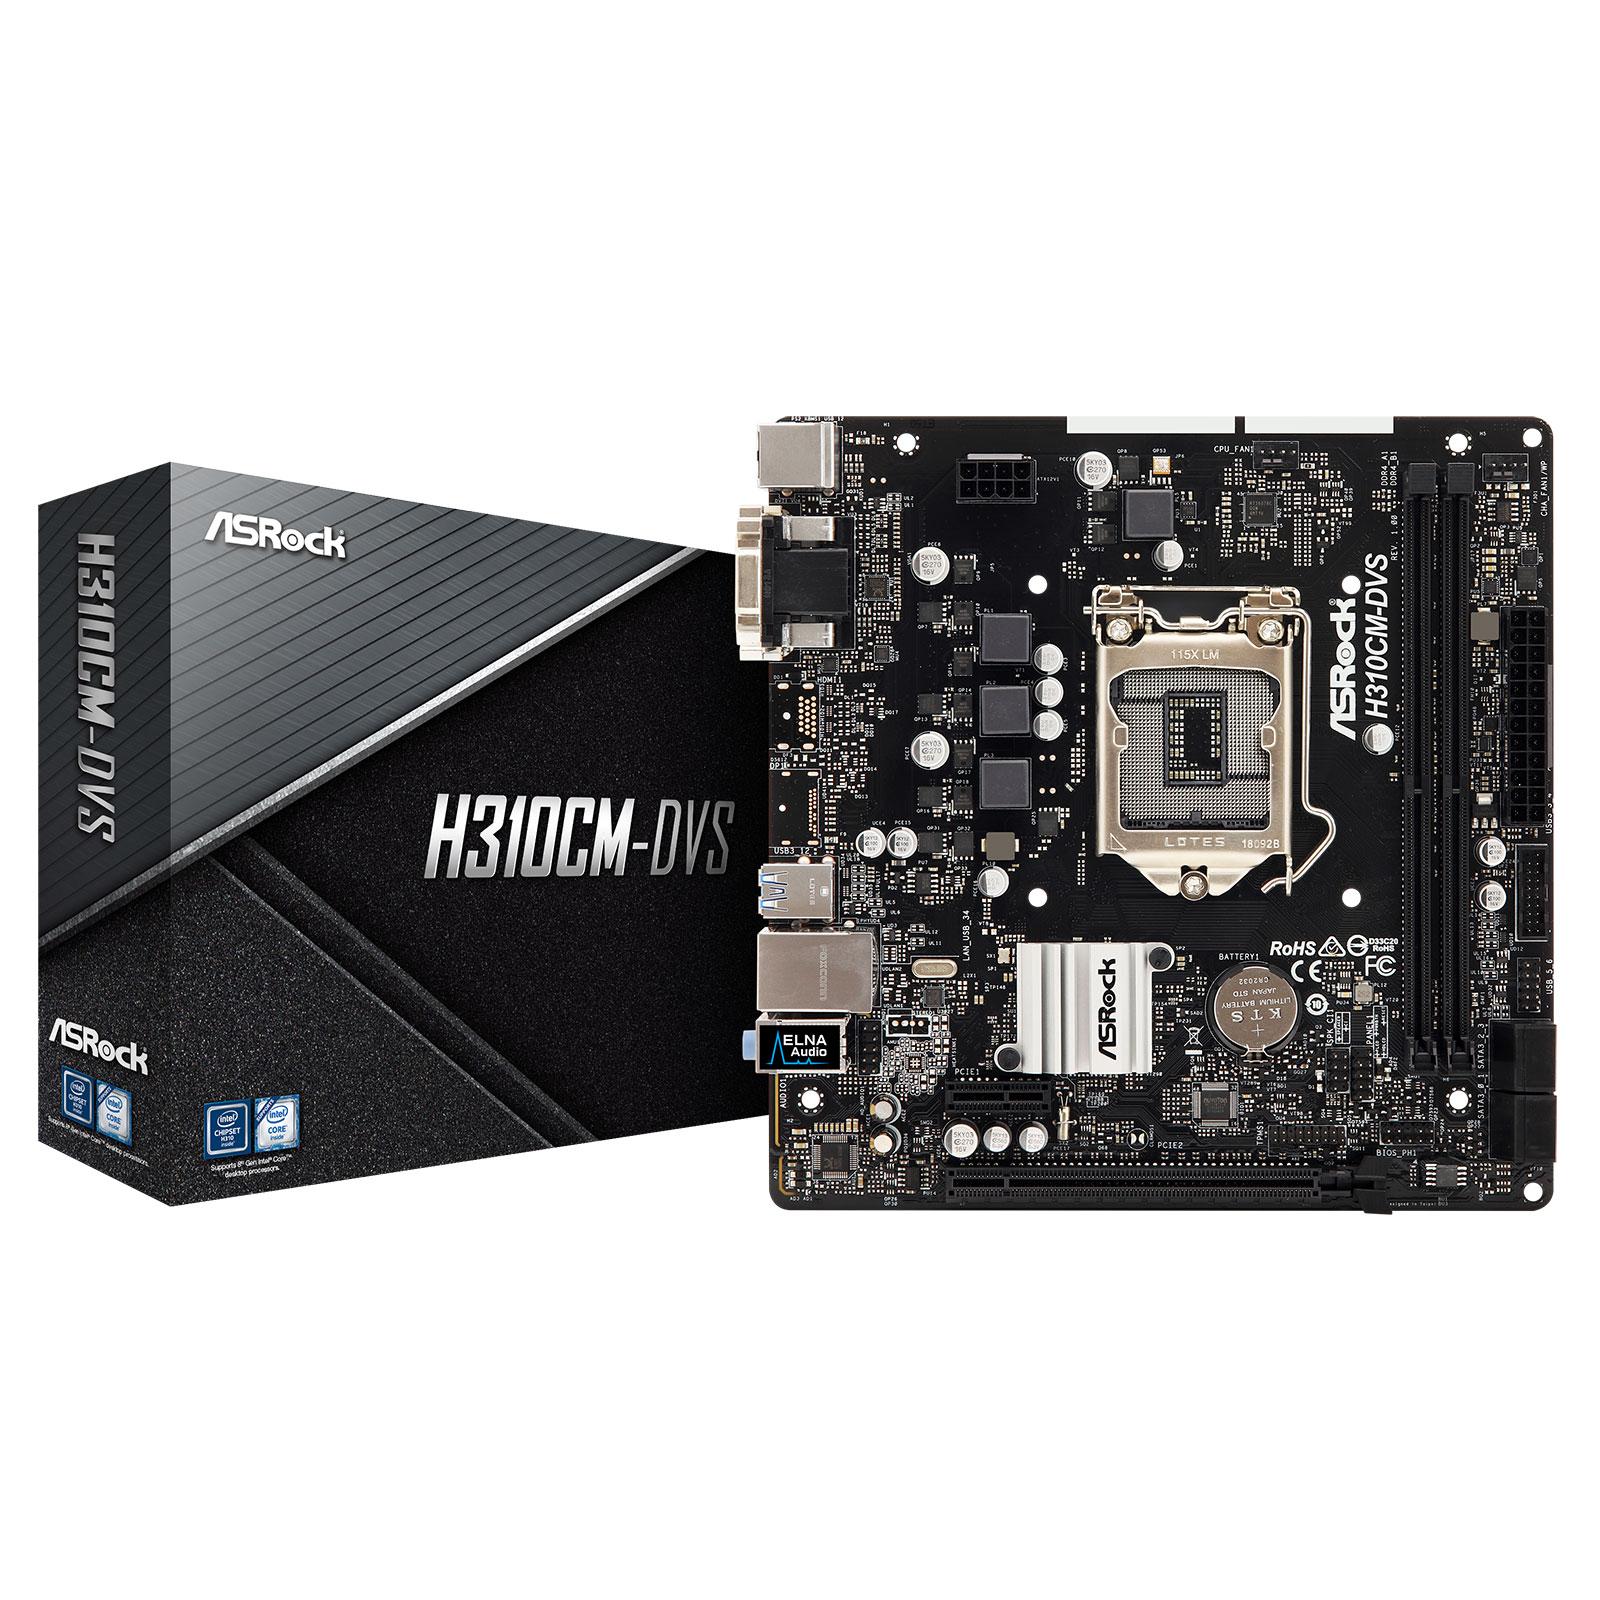 Carte mère ASRock H310CM-DVS Carte mère micro-ATX Socket 1151 Intel H310 Express - 2x DDR4 - SATA 6Gb/s - USB 3.0 - PCI-Express 3.0 16x